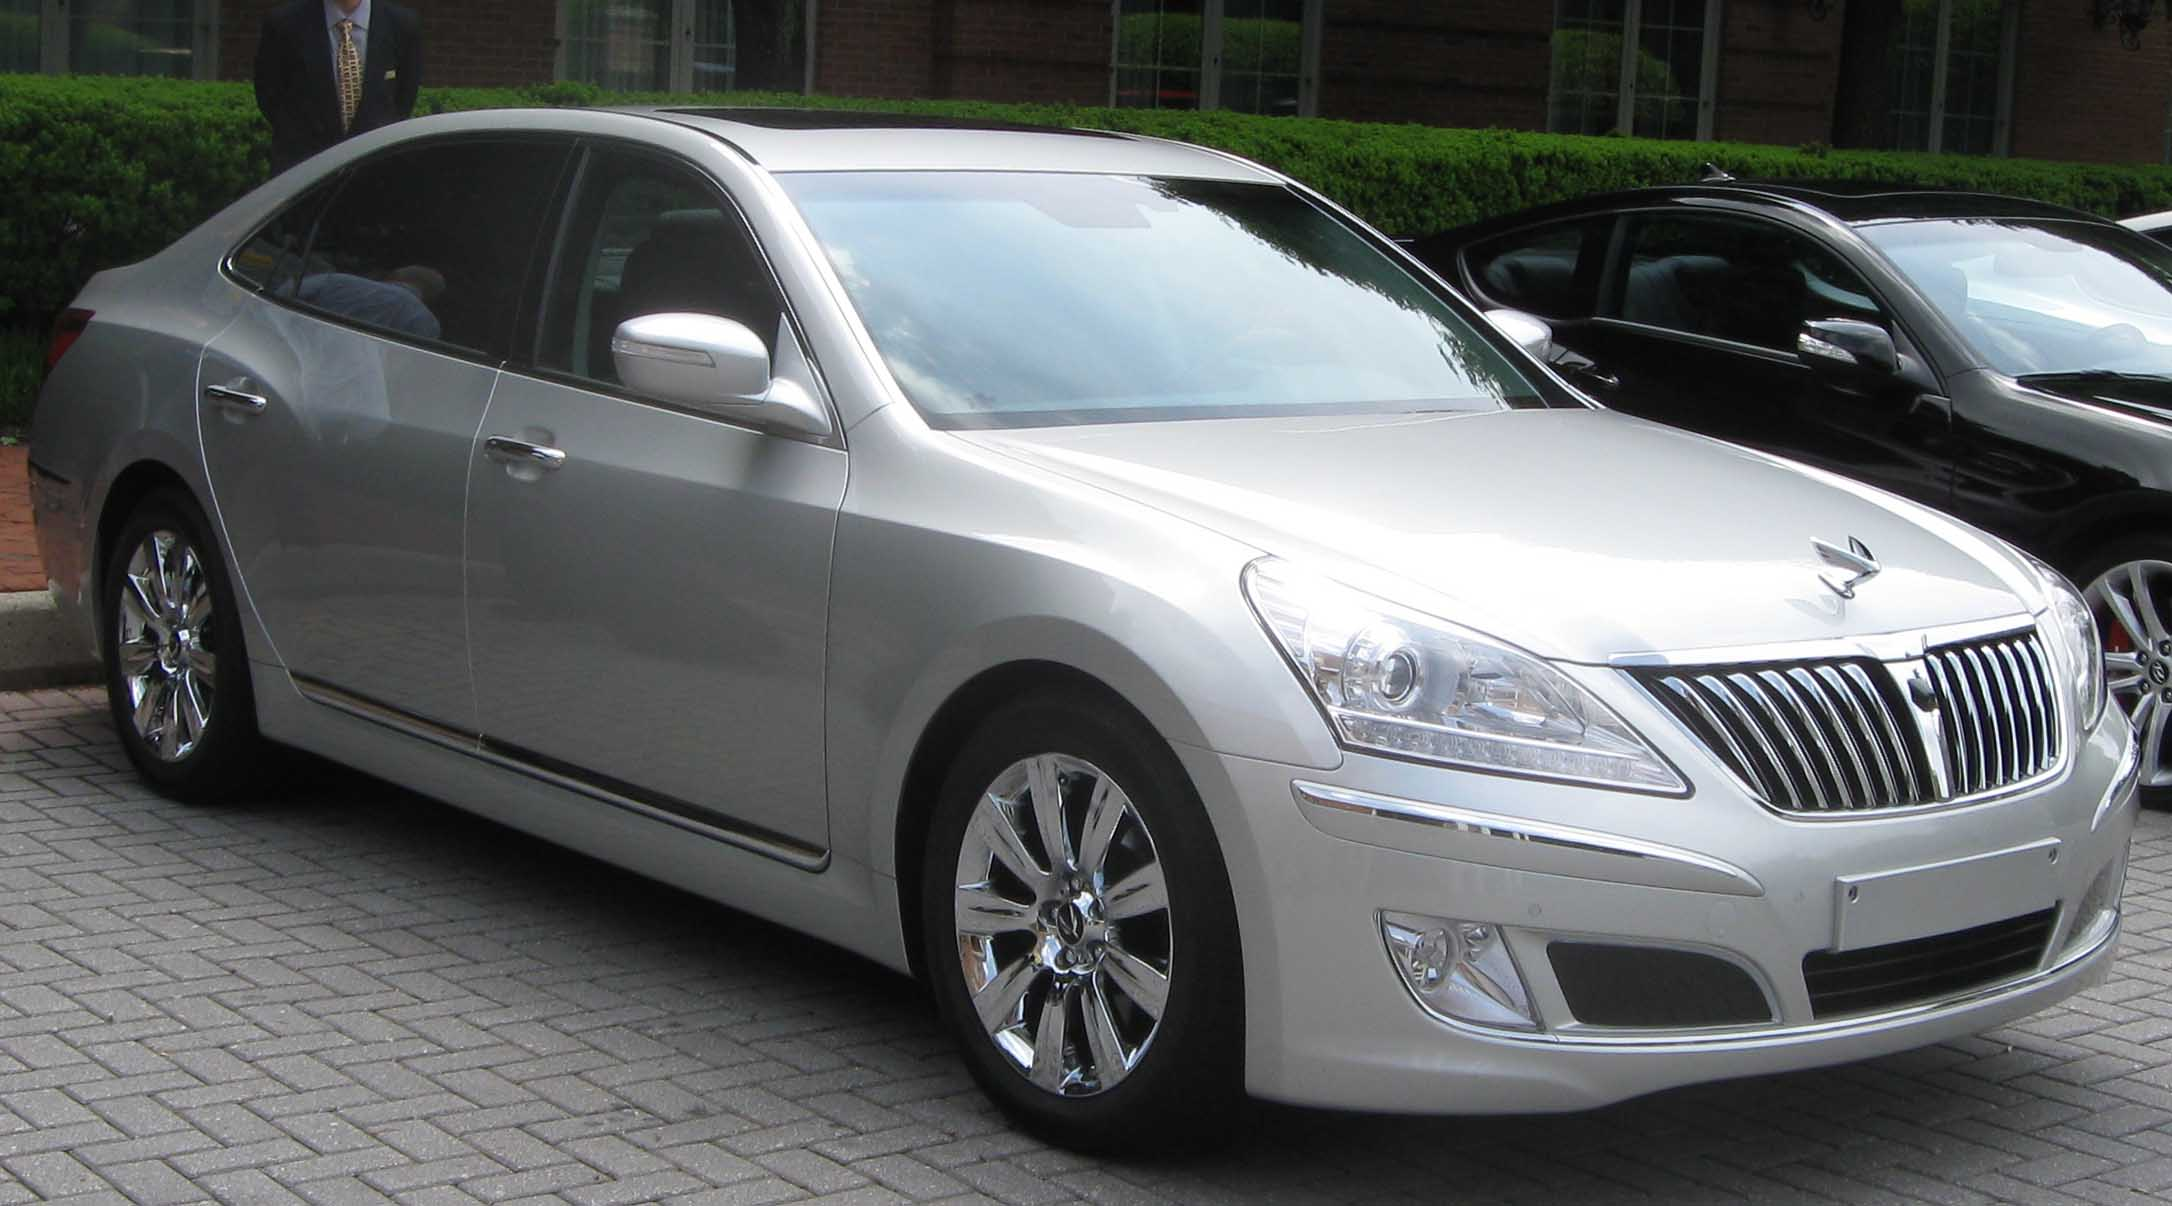 hyundai in africa top 5 used hyundai cars. Black Bedroom Furniture Sets. Home Design Ideas